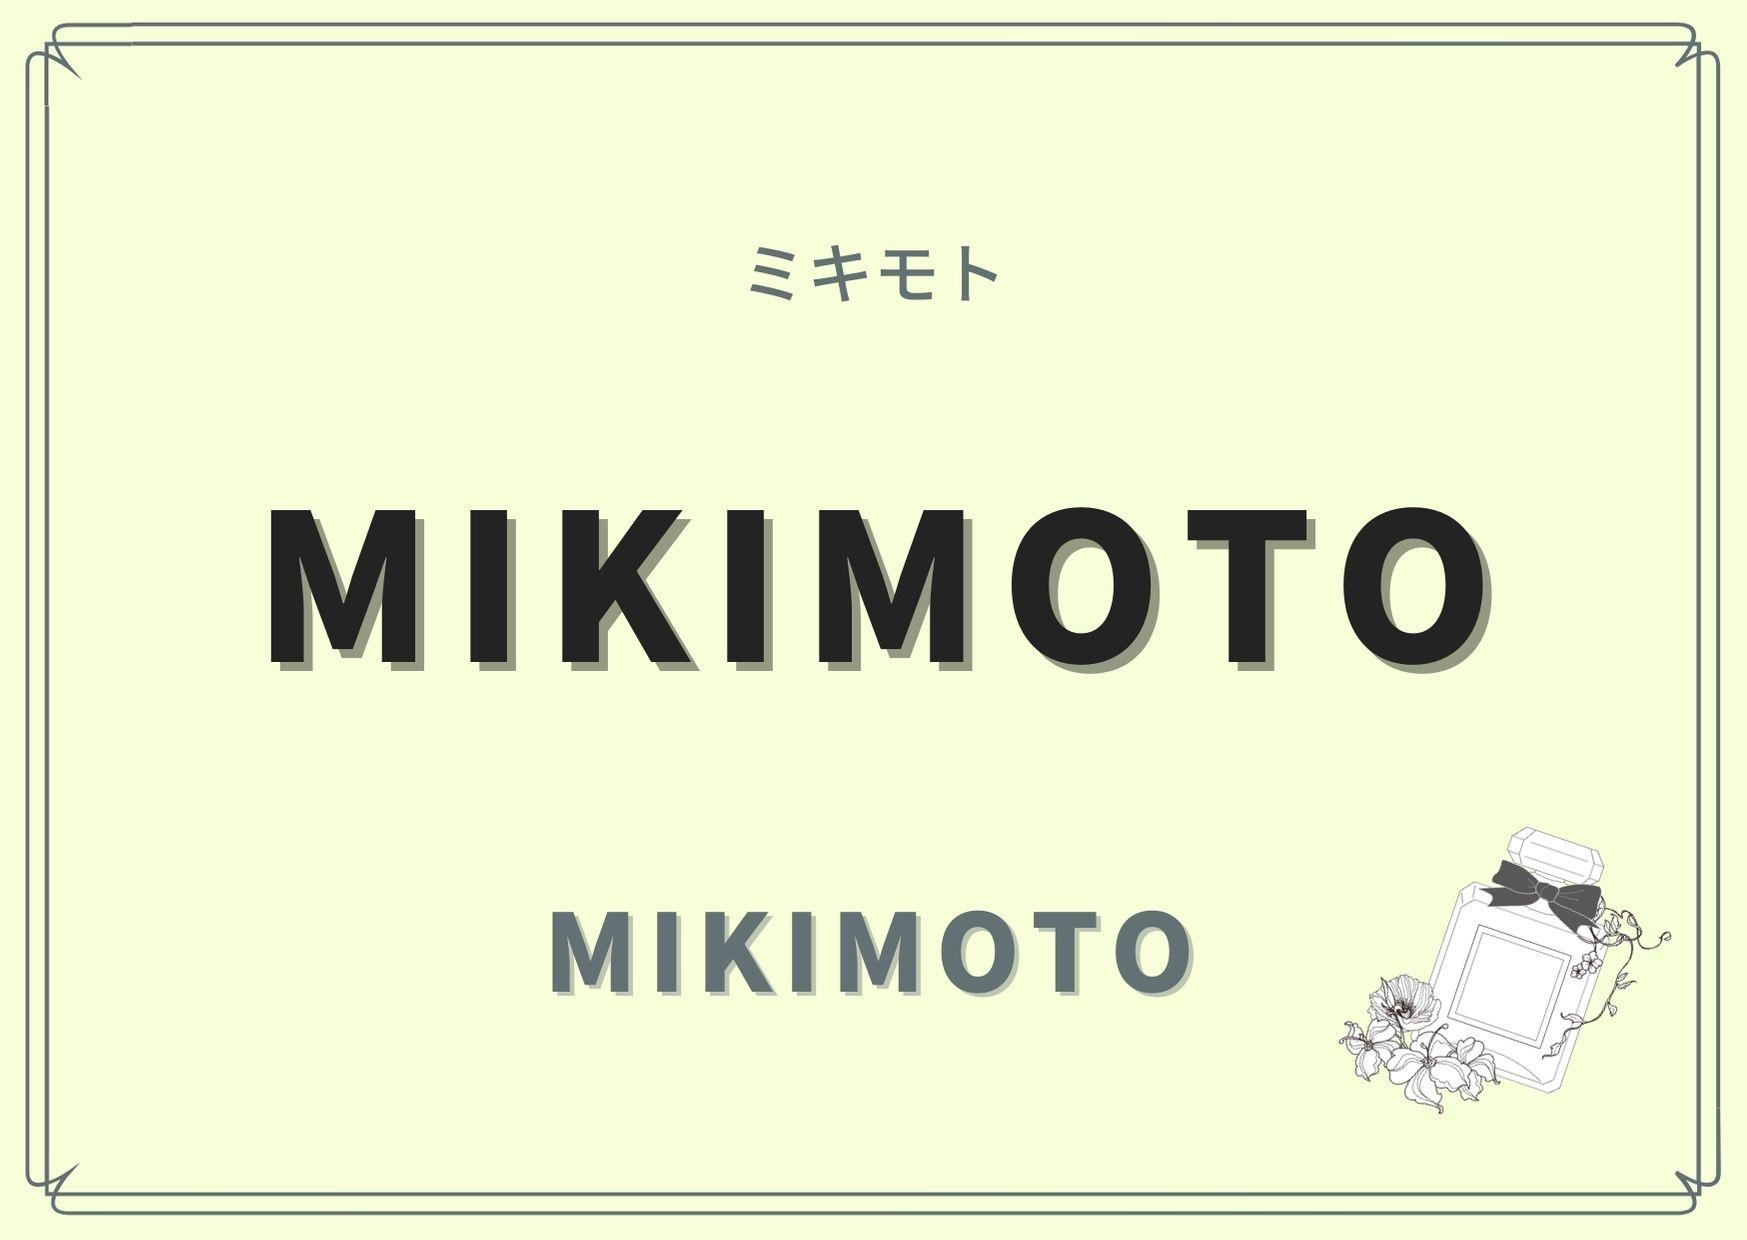 MIKIMOTO(ミキモト)/MIKIMOTO(ミキモト)